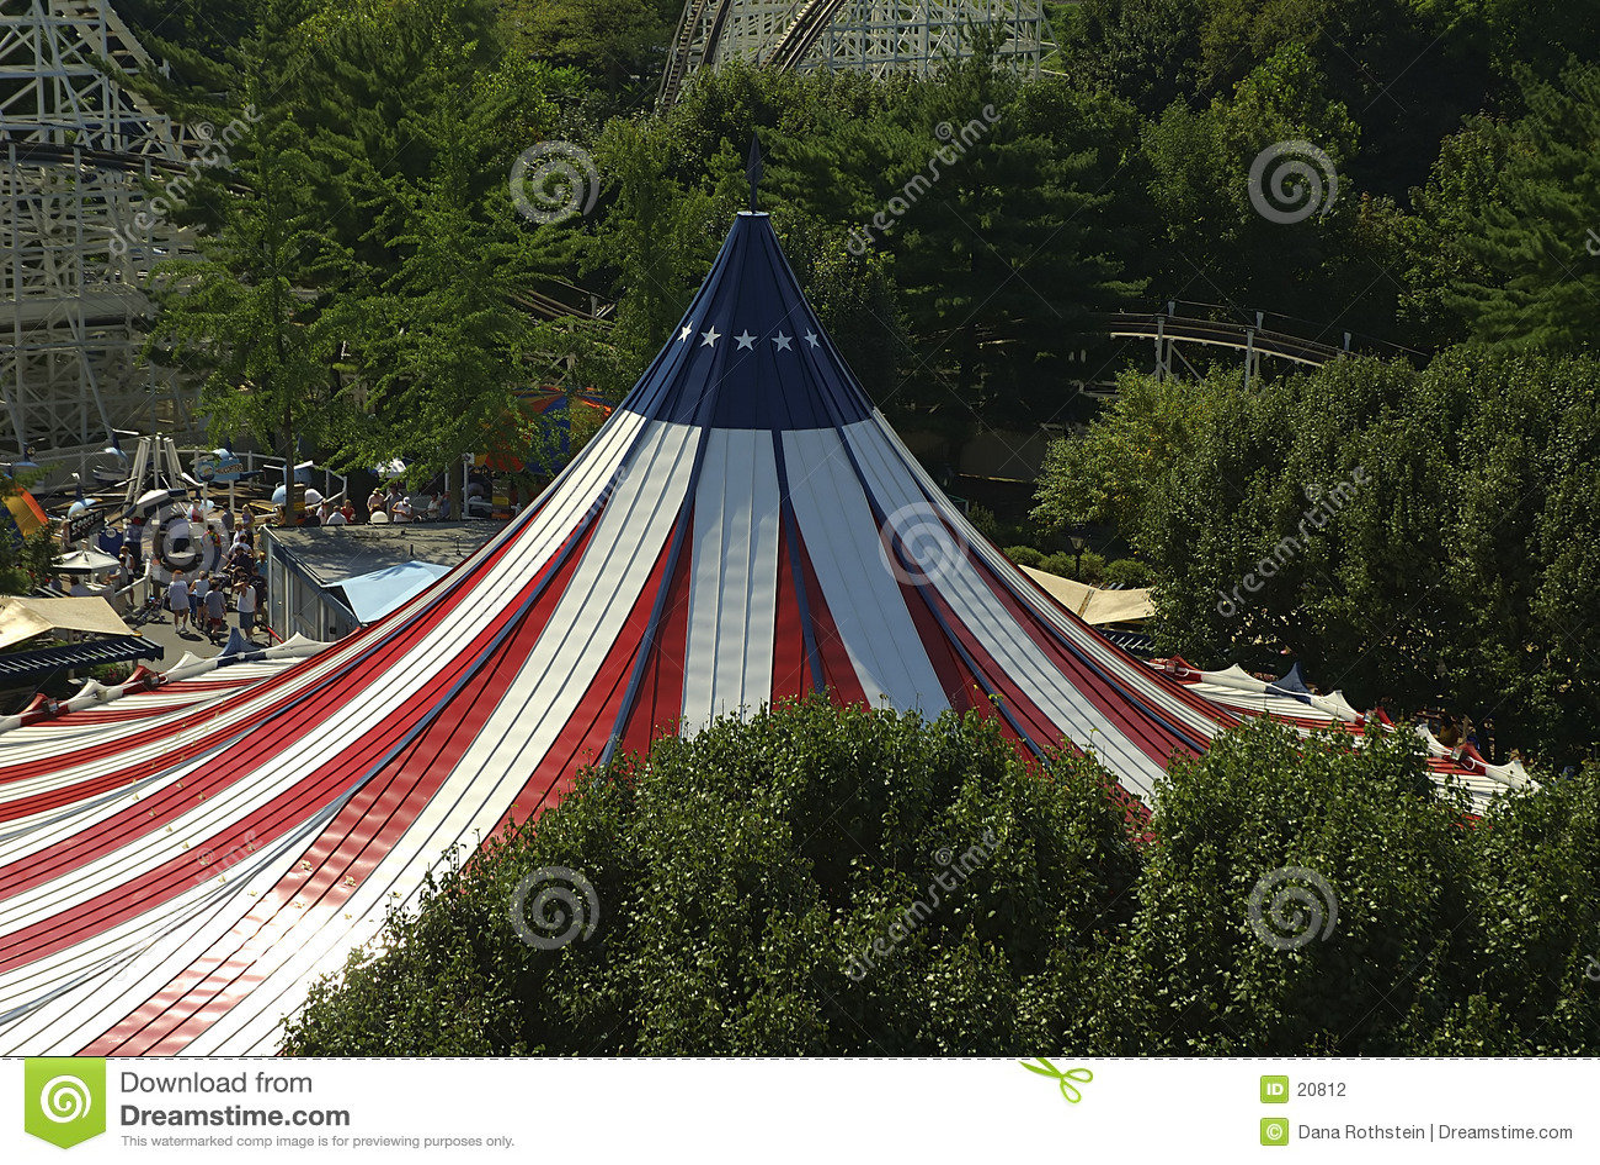 La grande tente